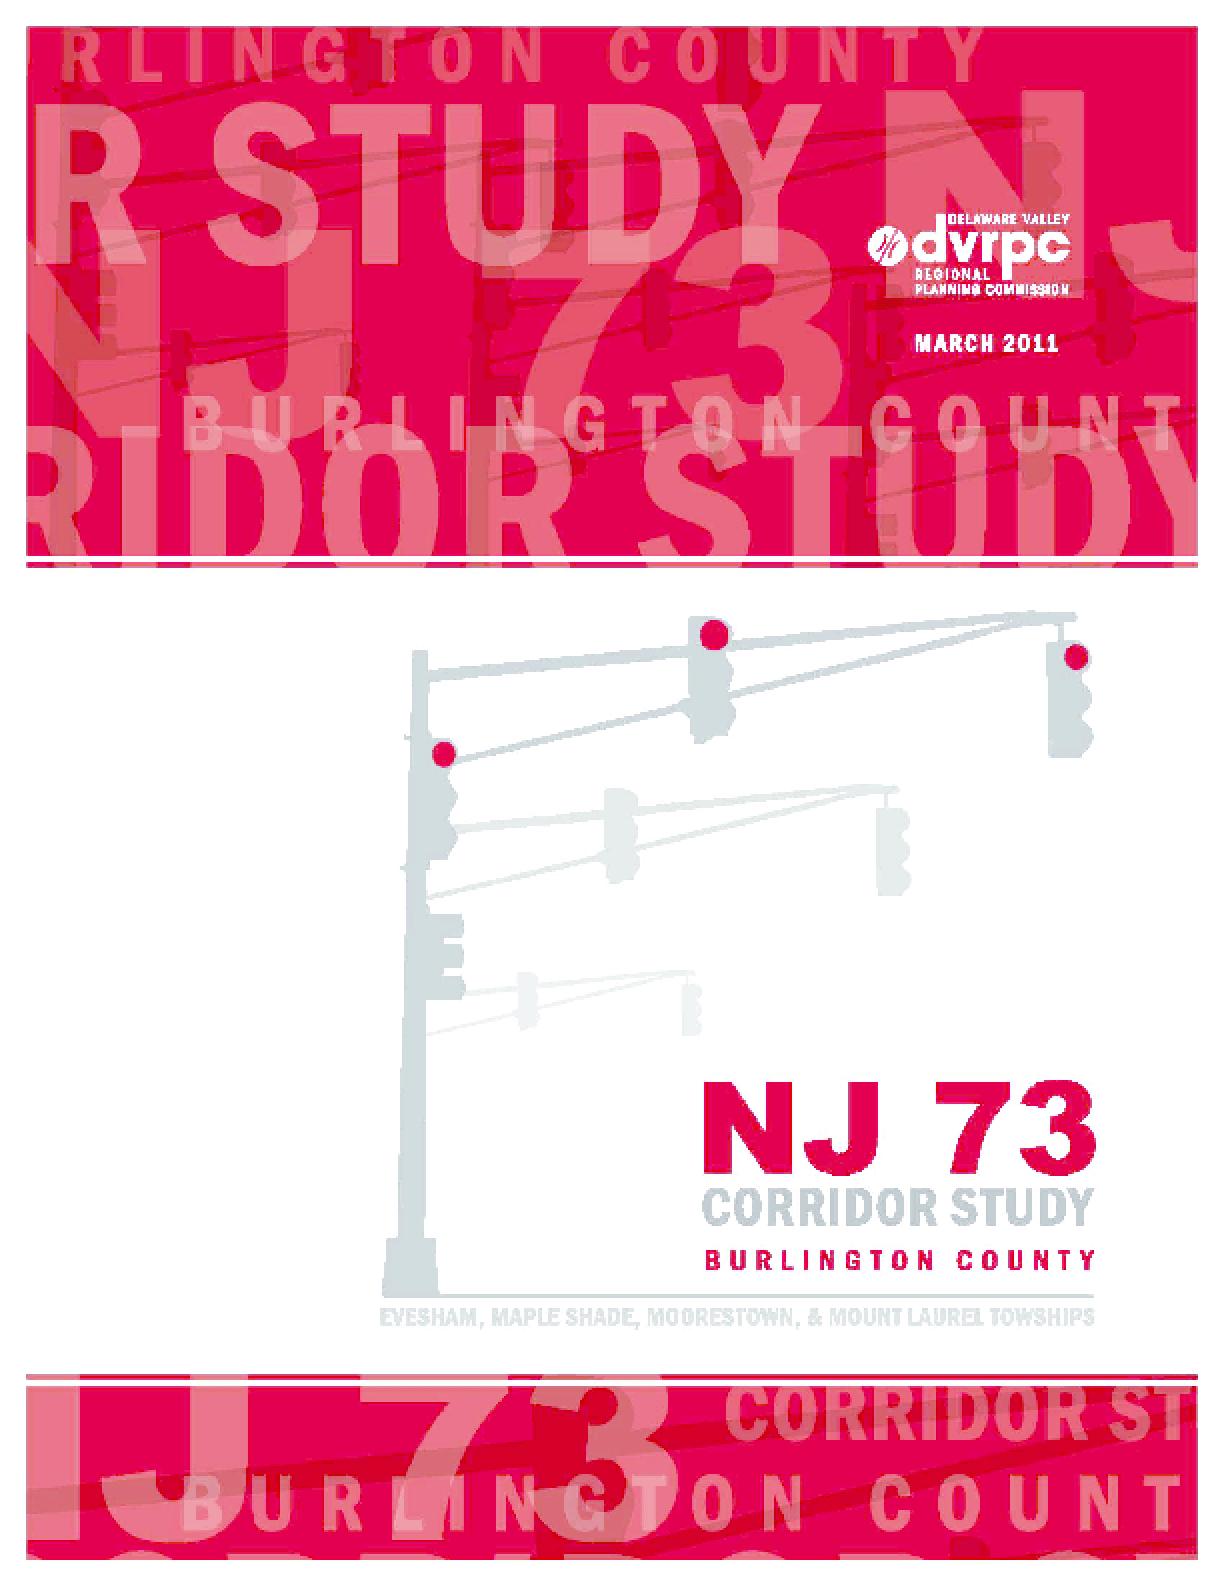 NJ 73 Corridor Study Burlington County